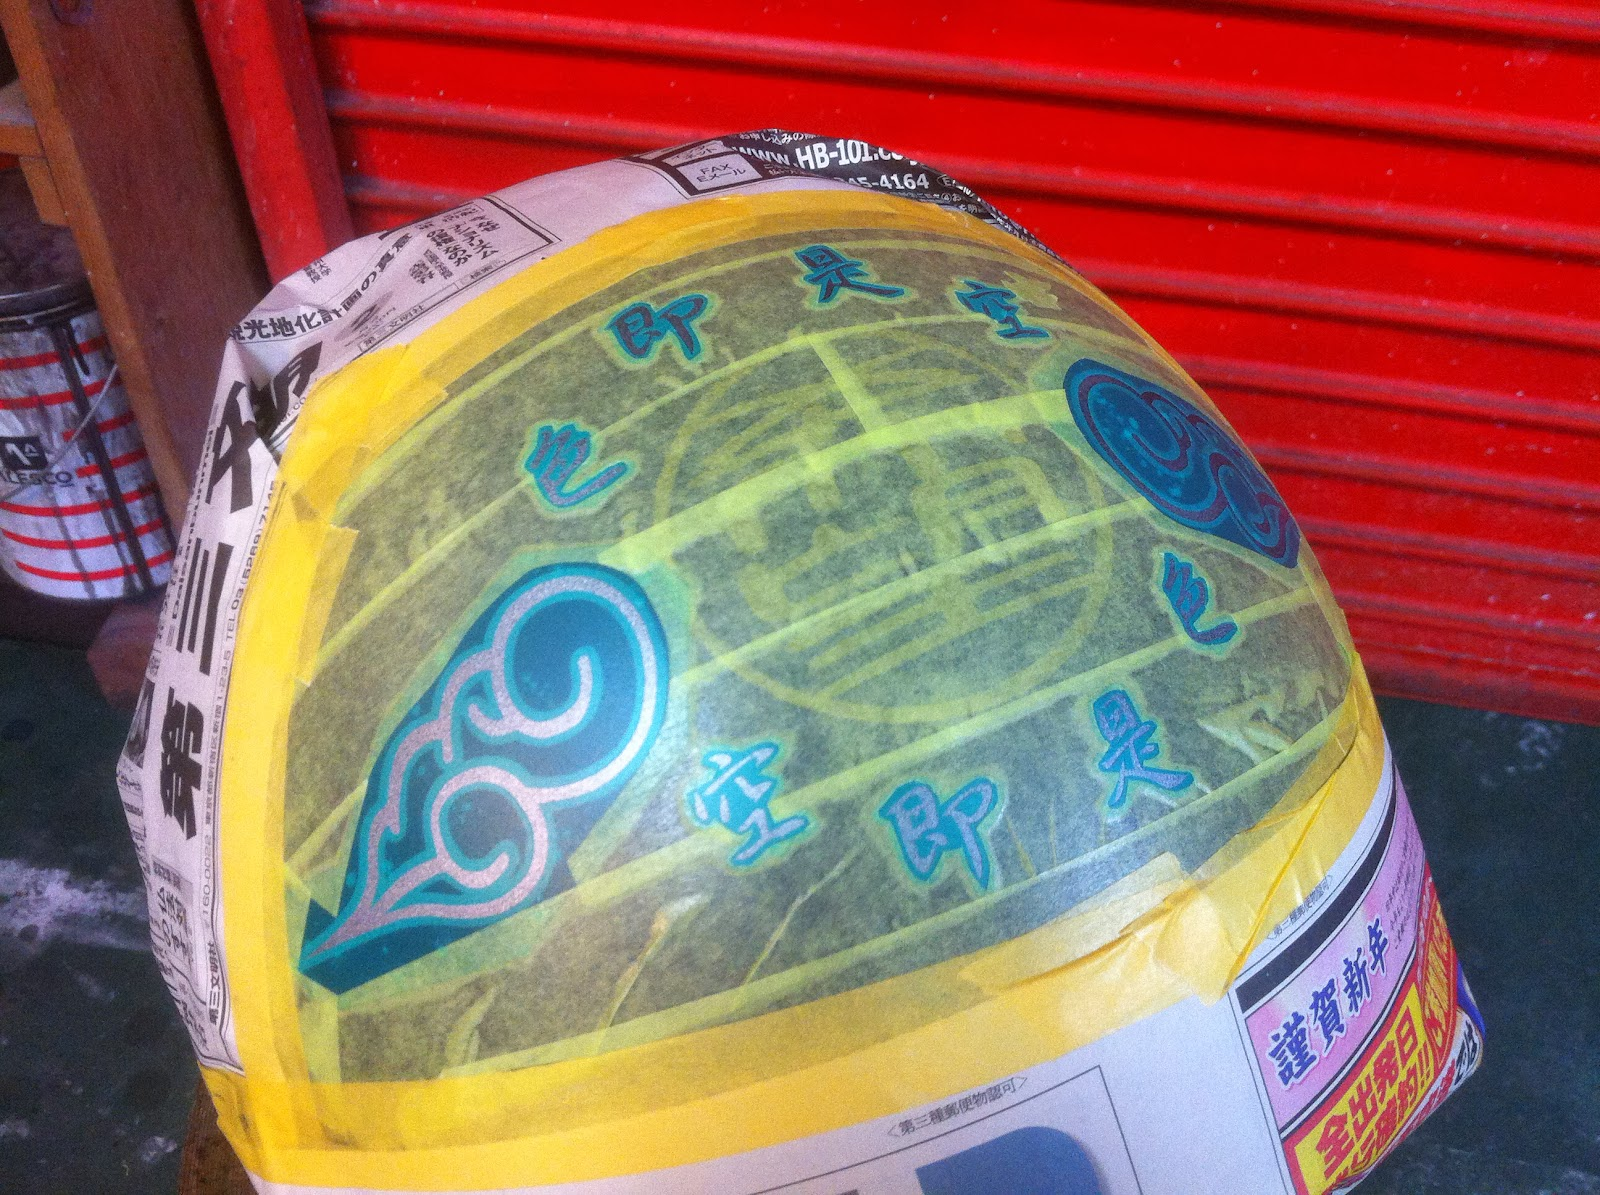 1215030248 - OGK ジェットヘル 7  後頭部分のキャンディカラー